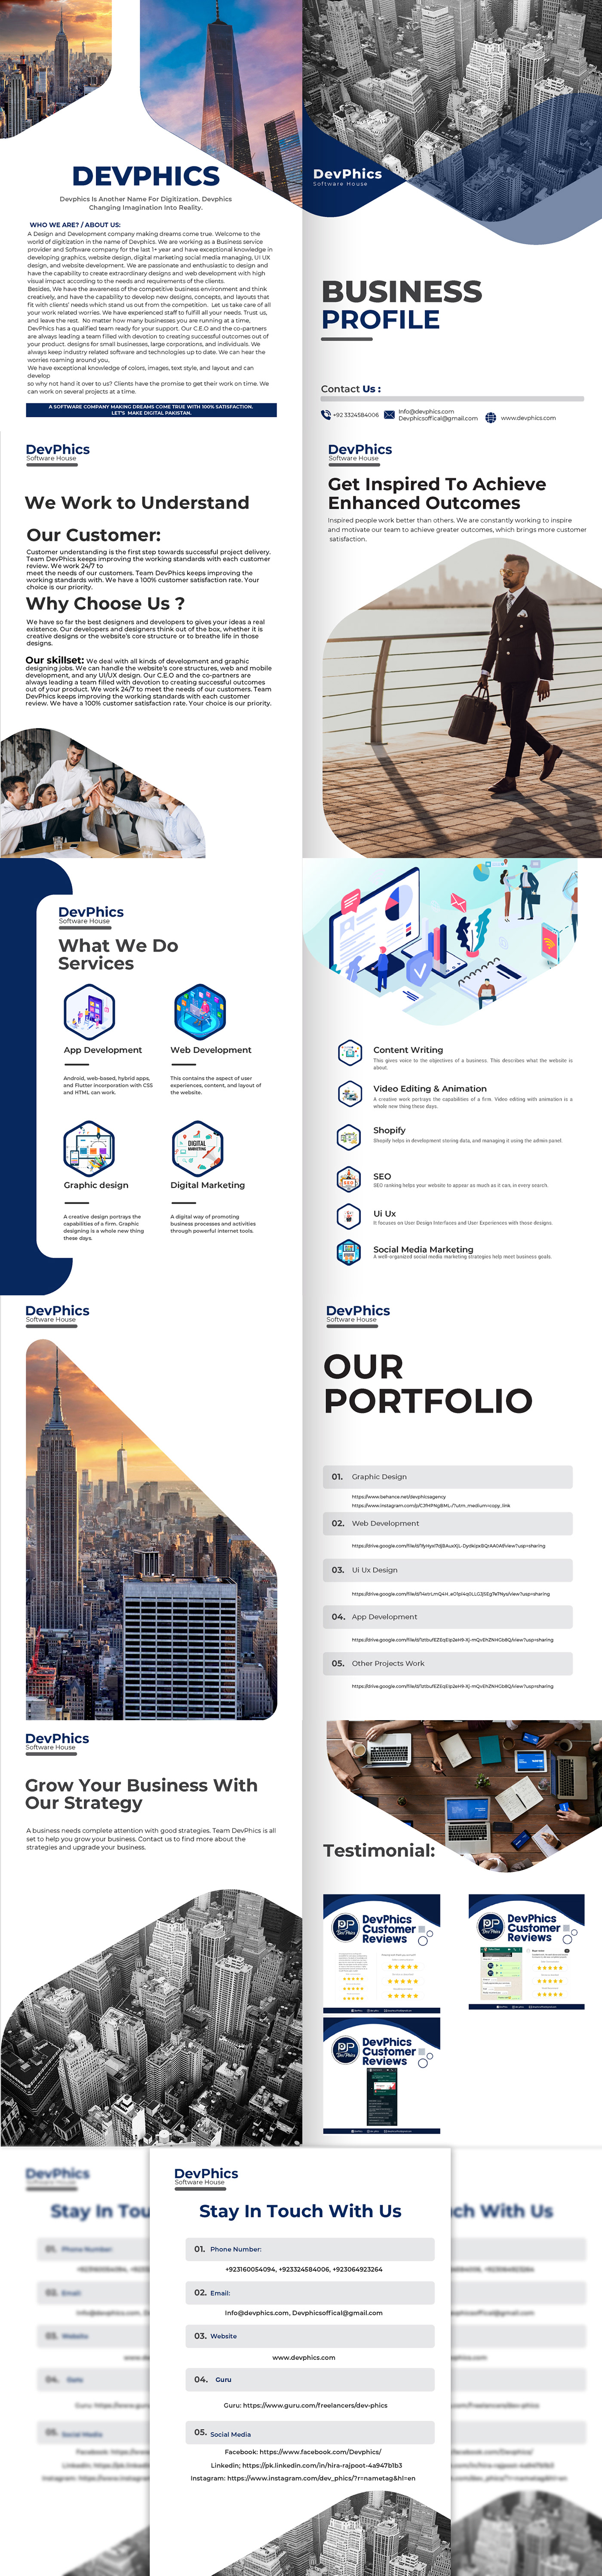 Adobe Photoshop Adobo illustrator business business profile graphic design  portfolio profile build profile template